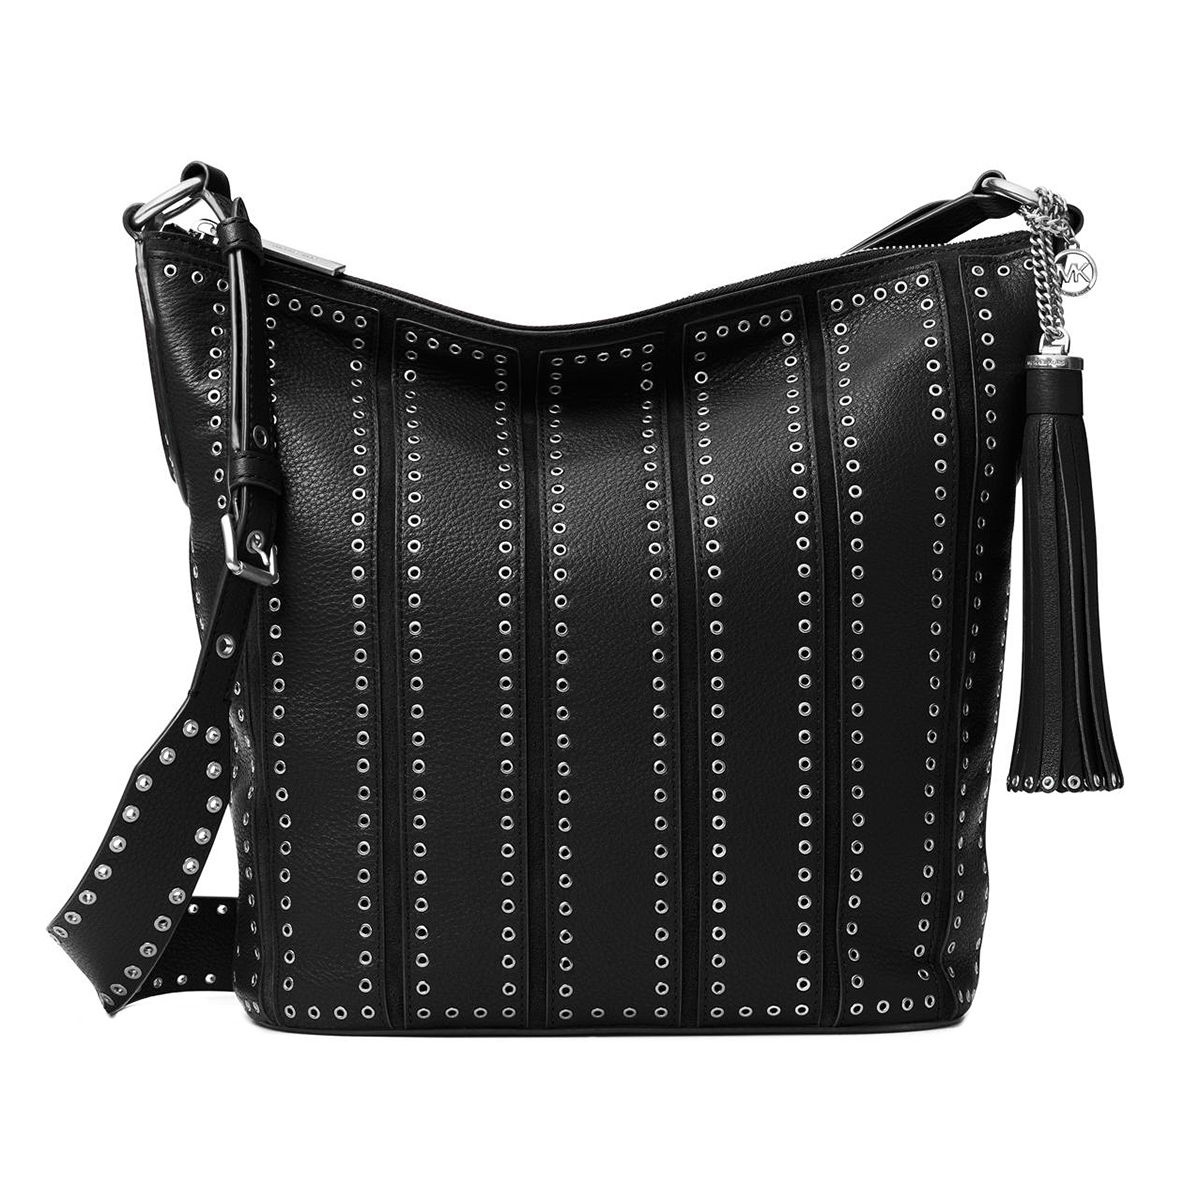 کیف دوشی زنانه مایکل کورس مدل Brooklyn Grommet